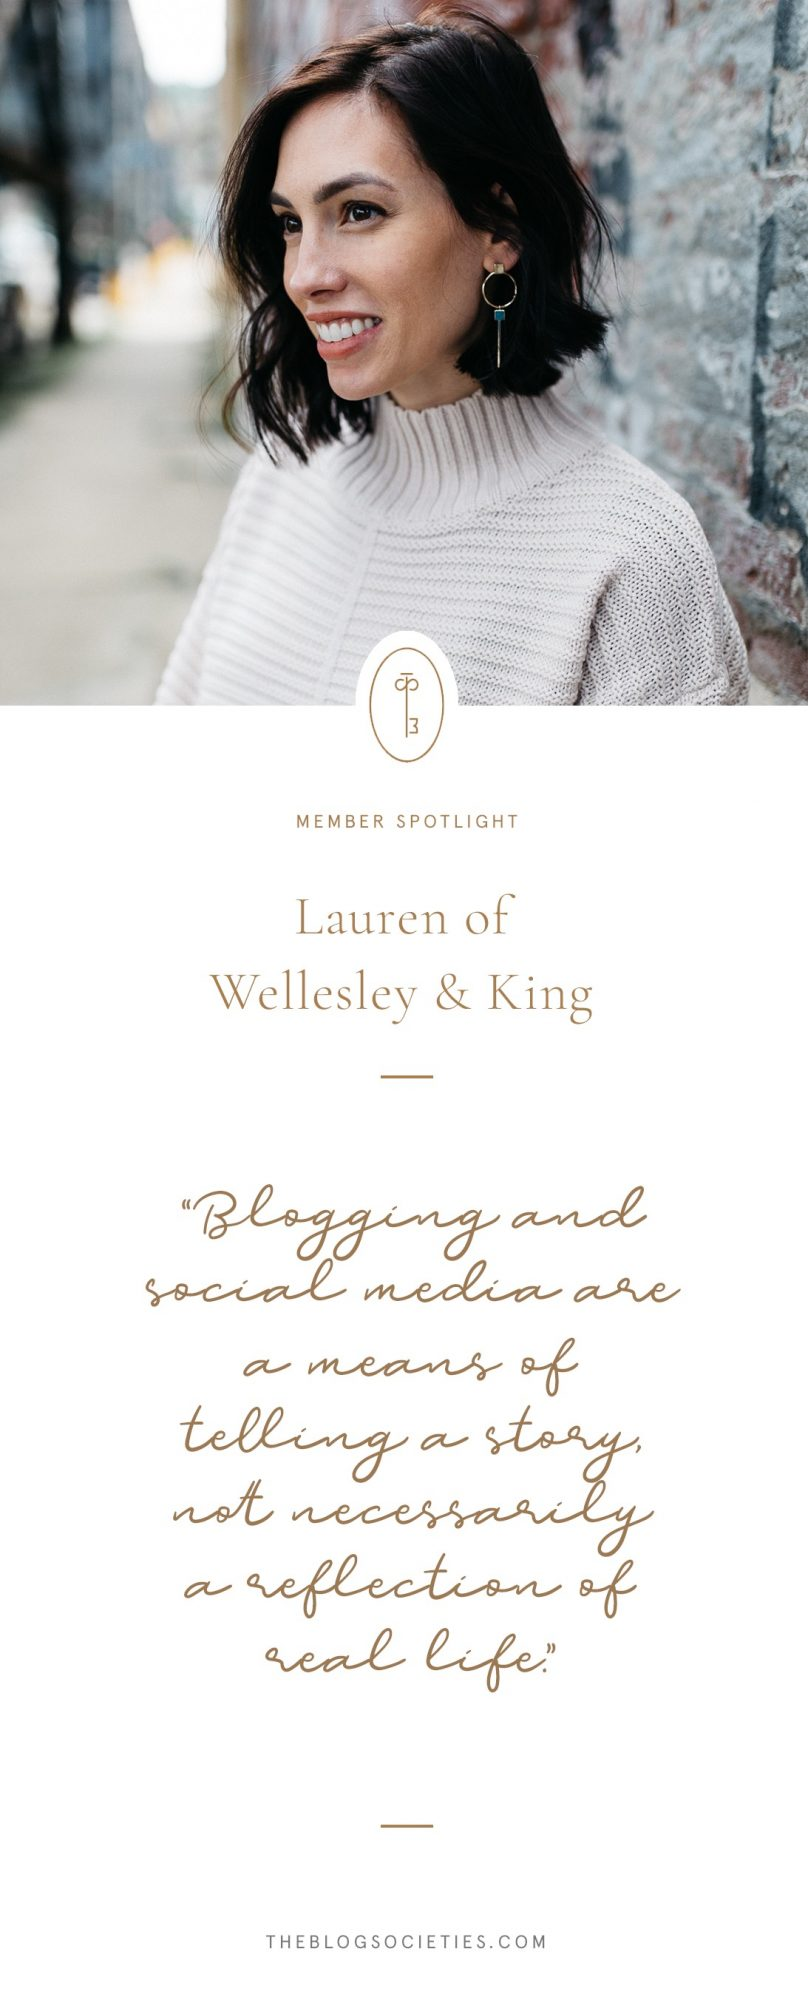 Wellesley & King Blog